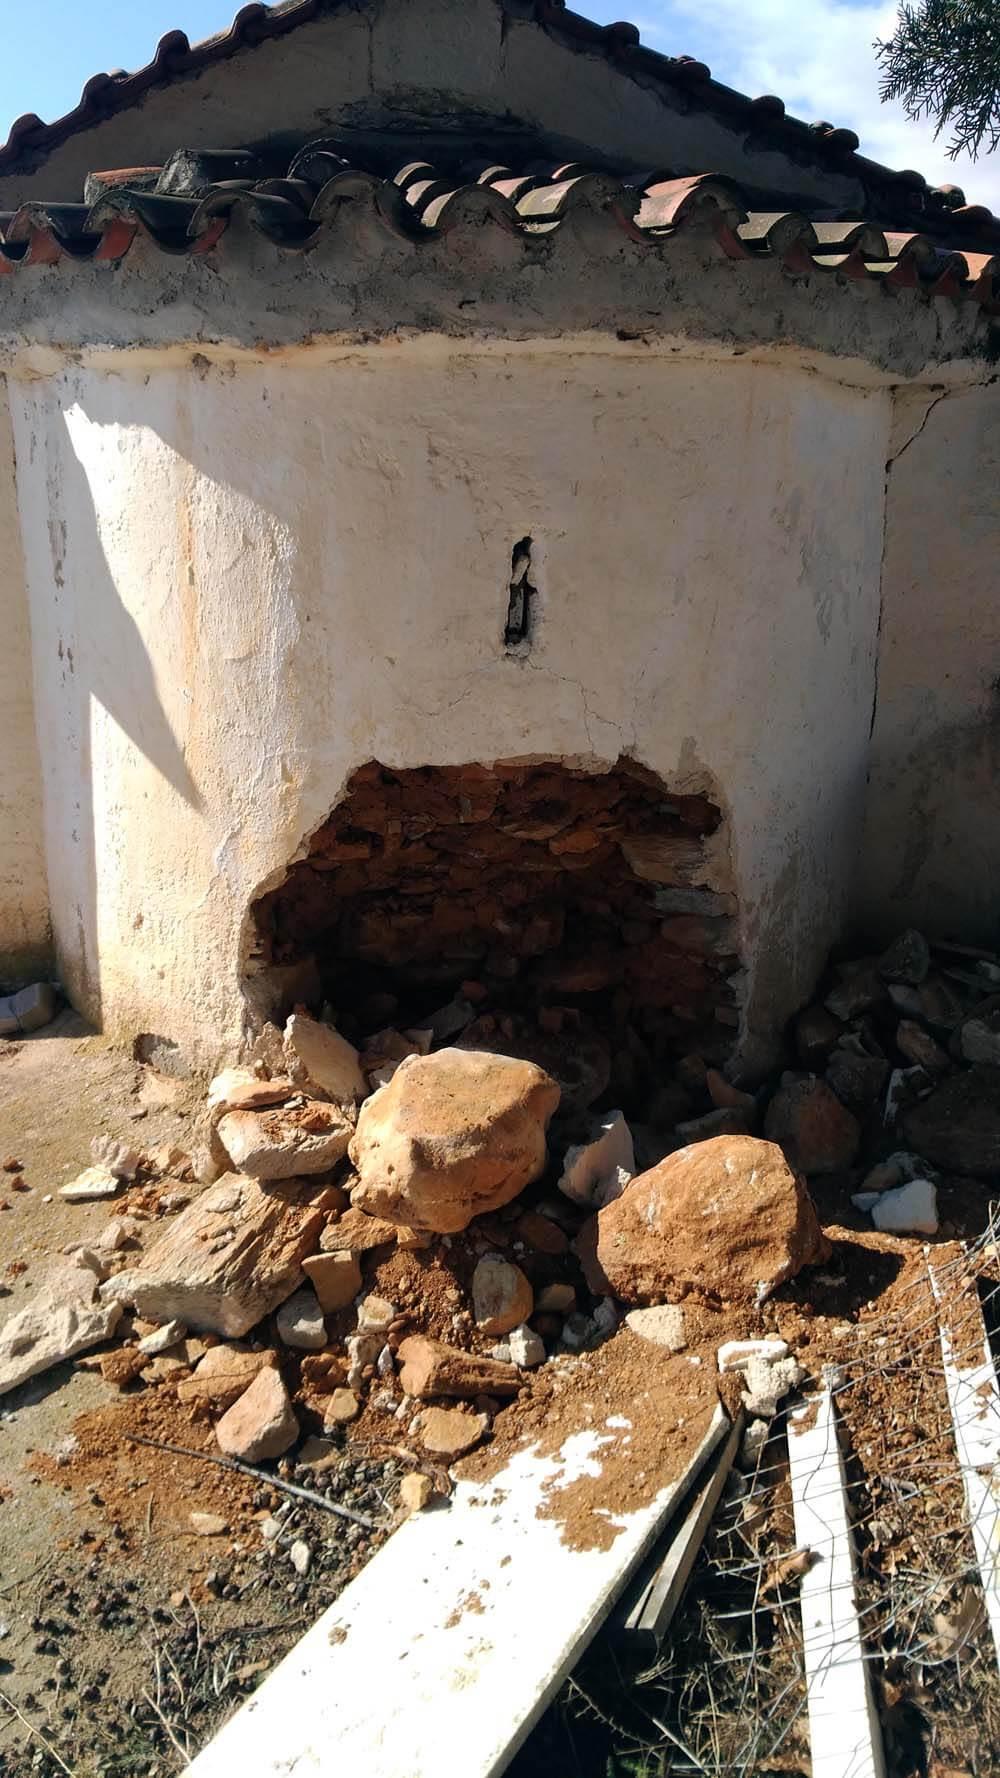 EKKLISIA DOLIXI3 - Διέλυσαν την εκκλησία για να βρουν λίρες στη Δολίχη Ελασσόνας